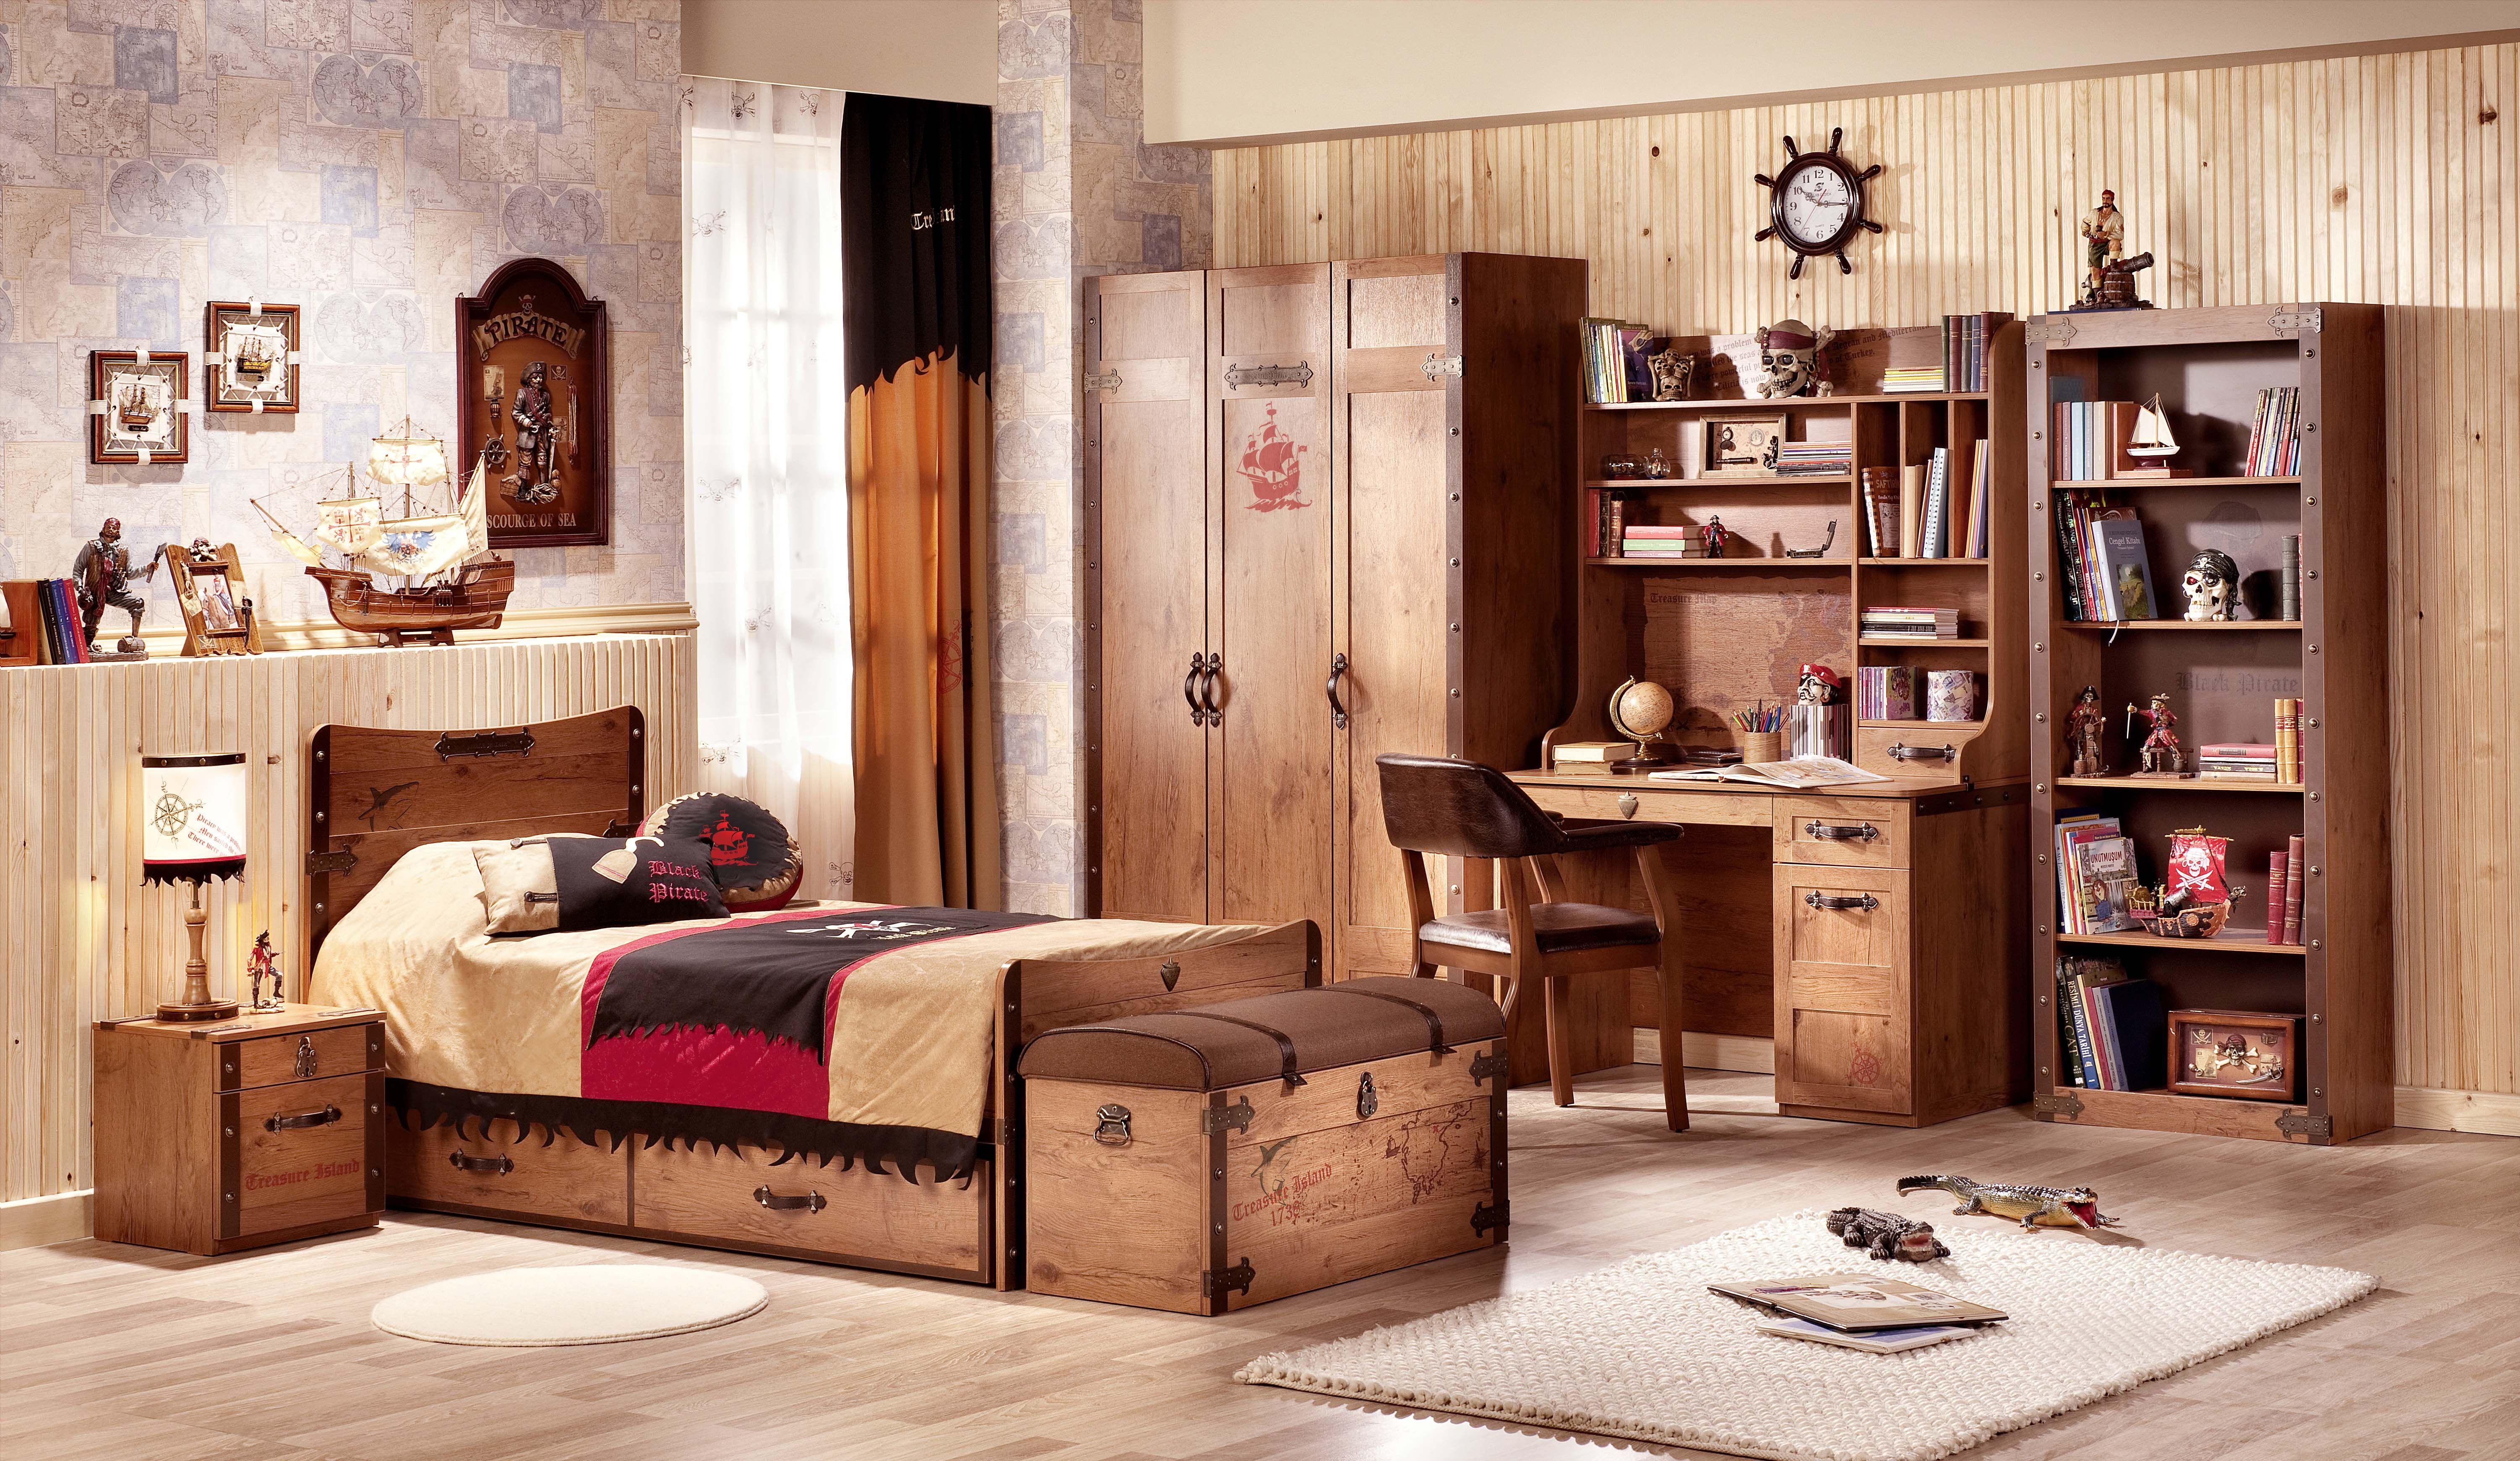 Habitaci N Pirata De La Serie Black Pirate De Cilekspain  # Muebles Infantiles Lupi Love